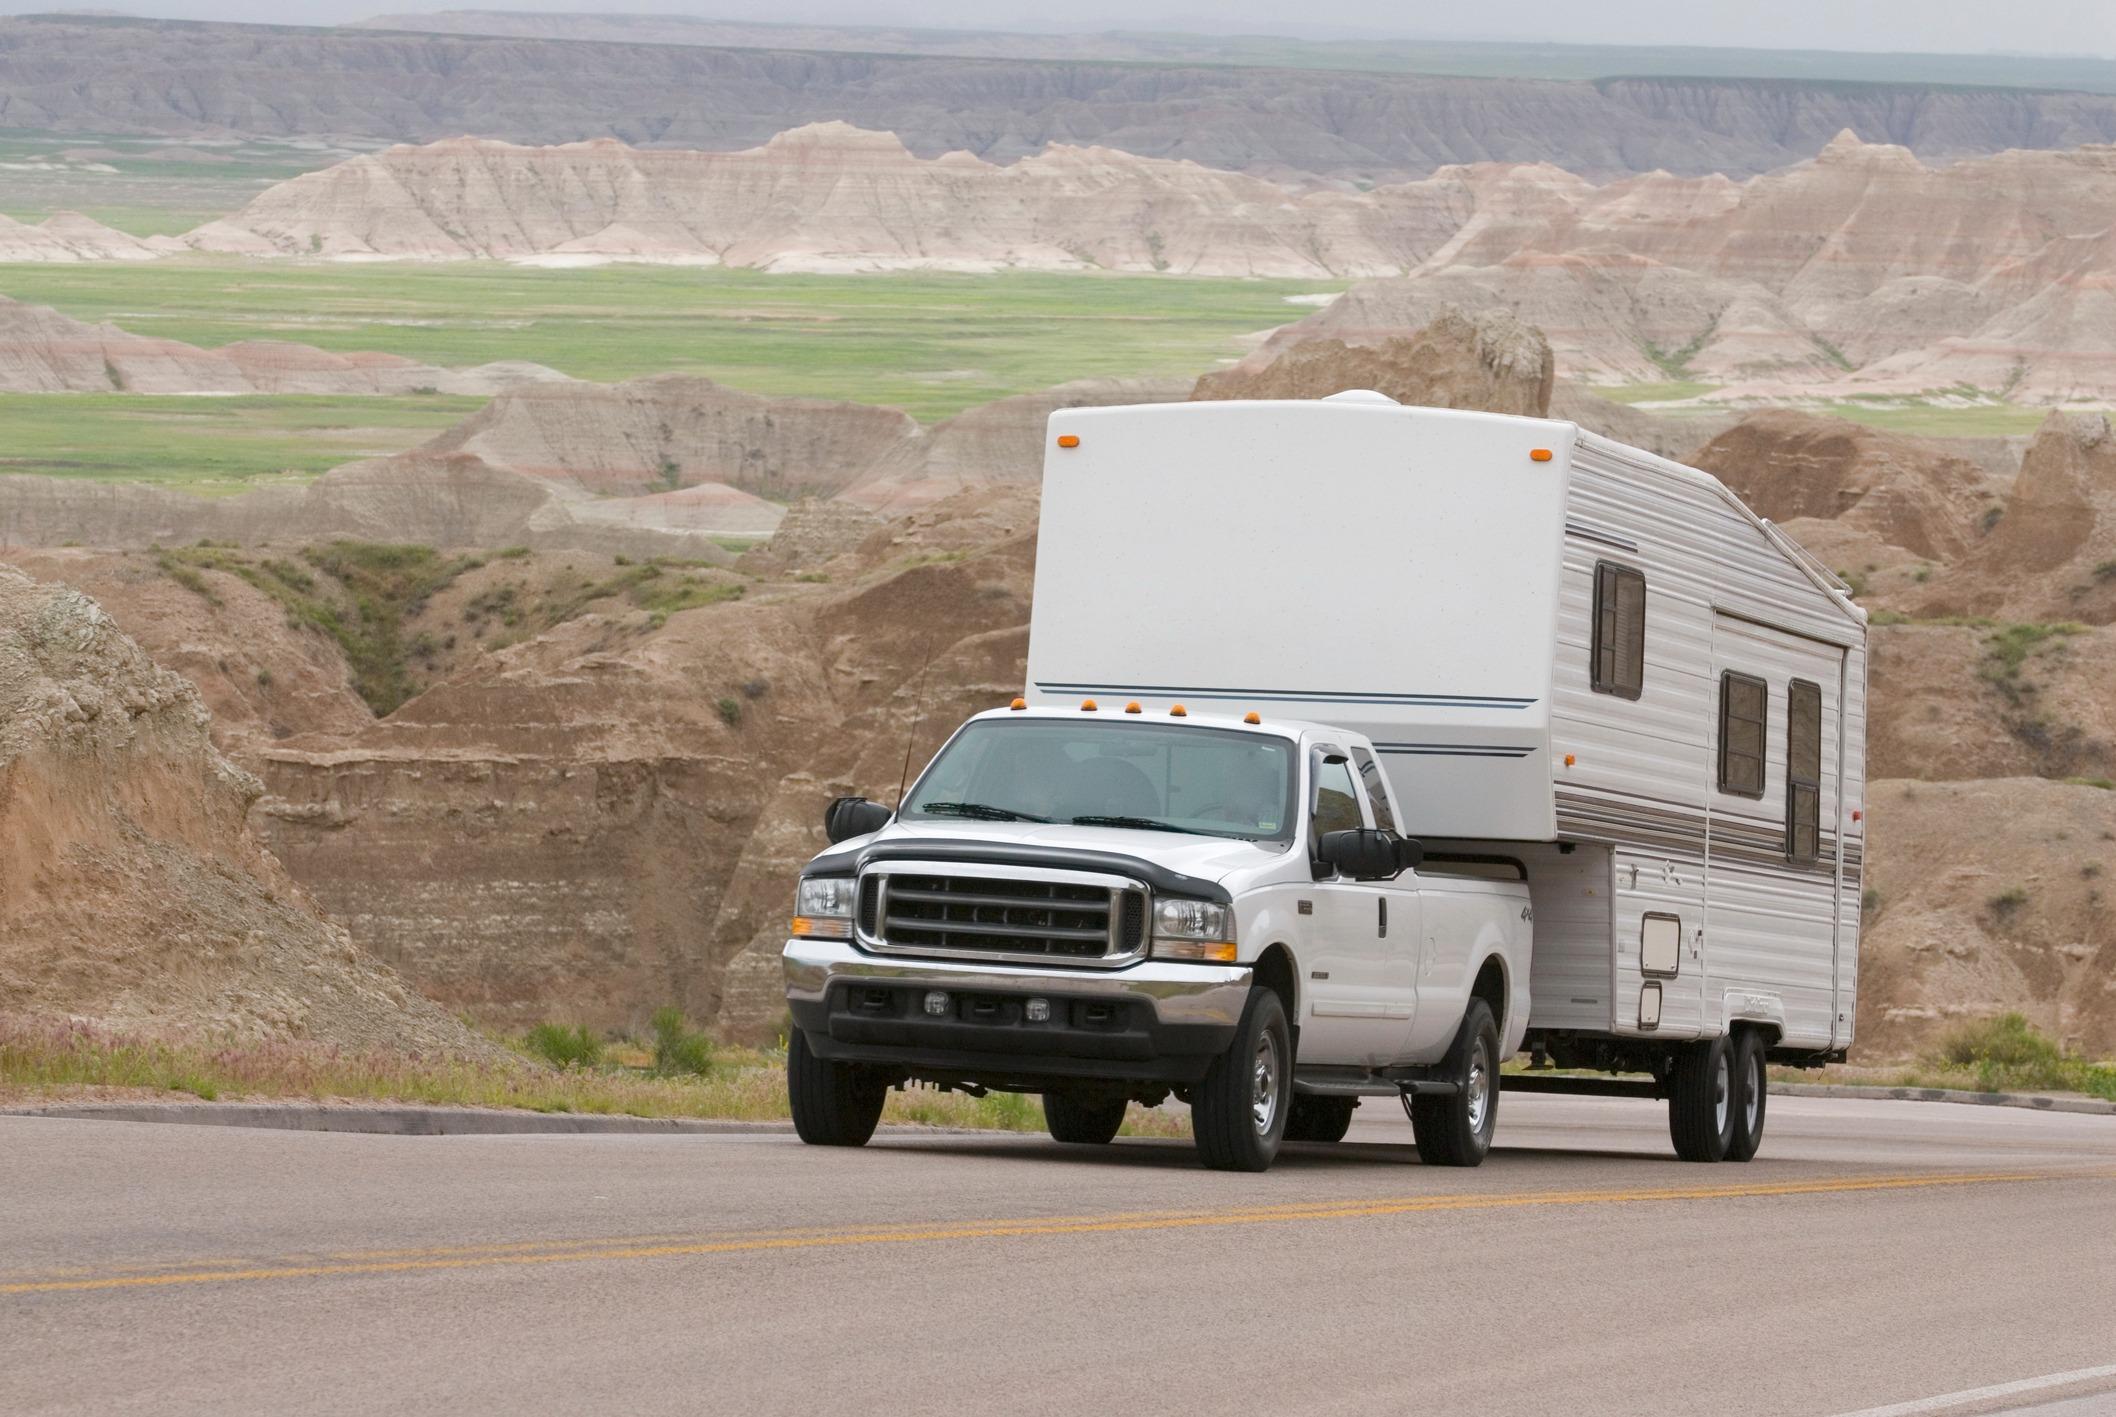 RV trailer in the badlands